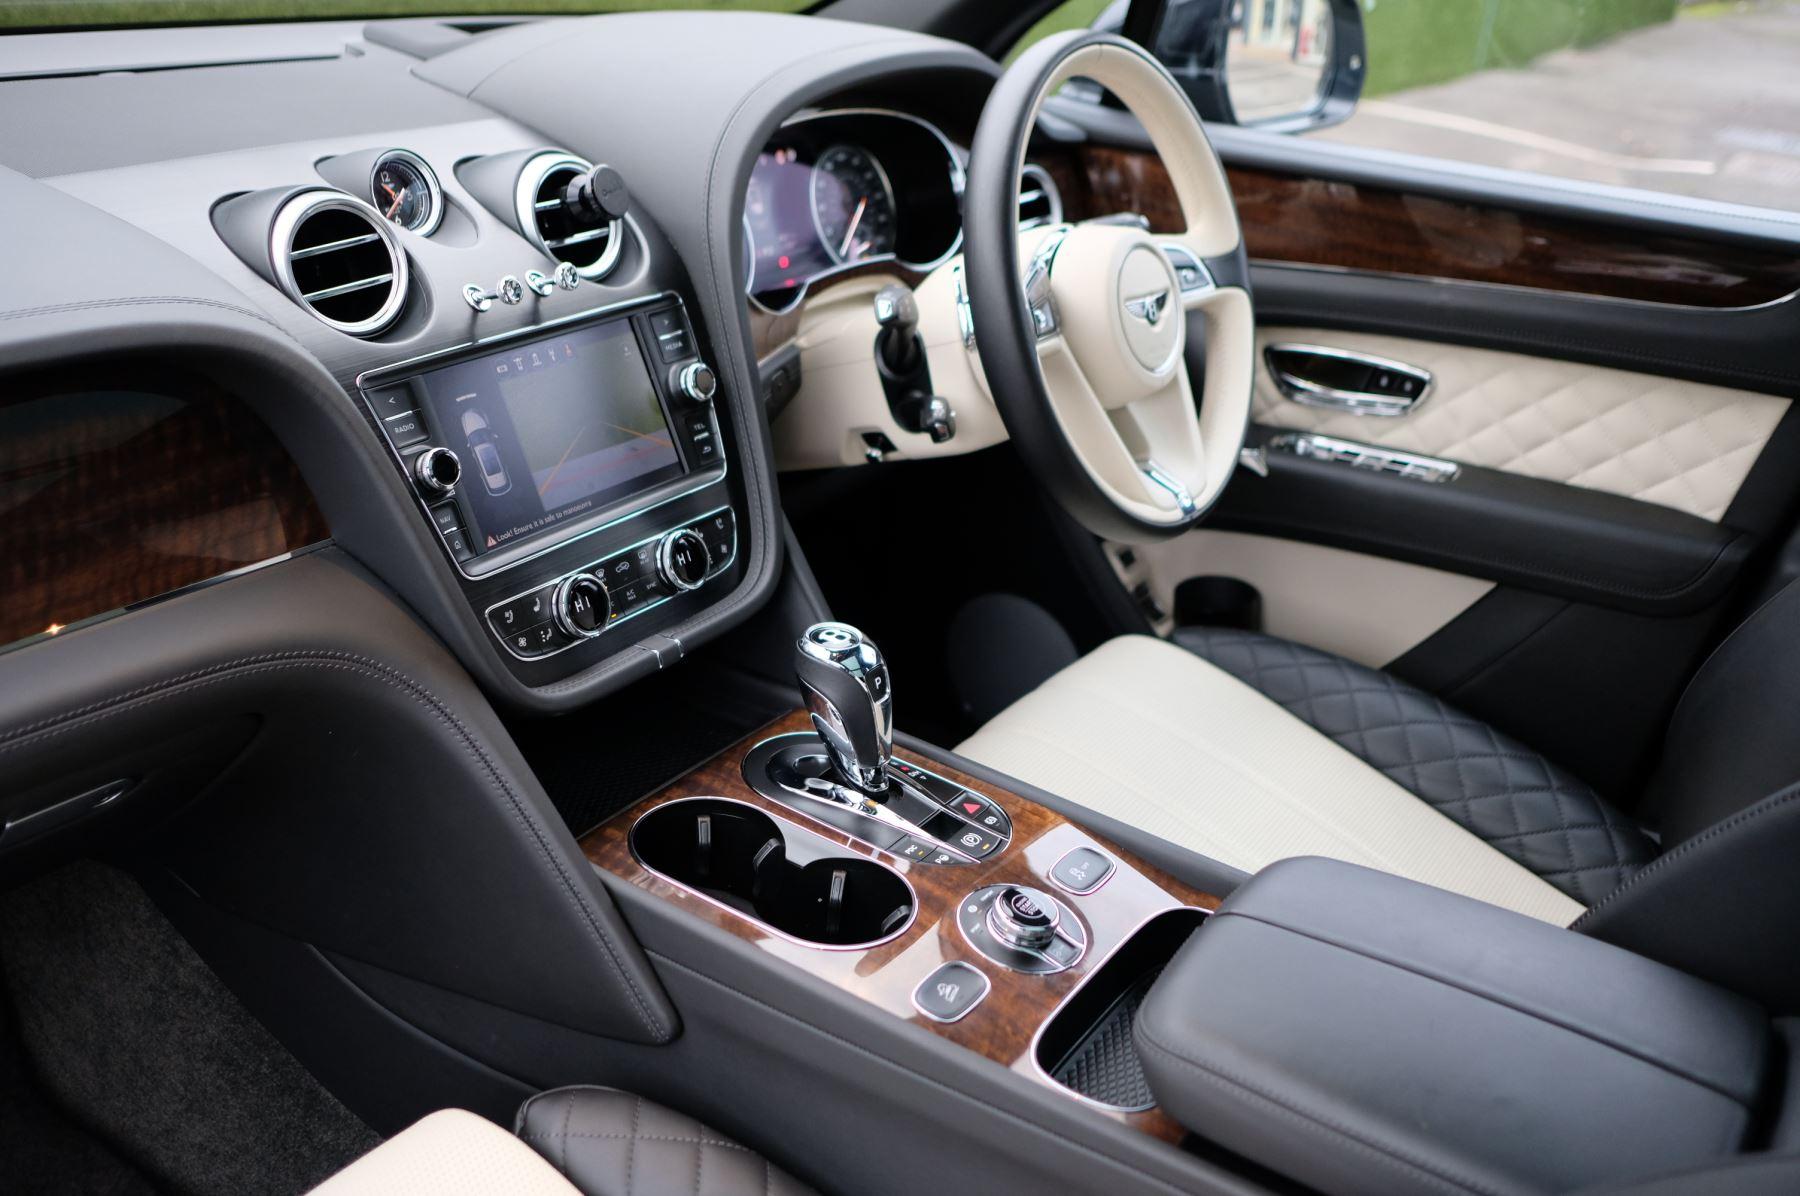 Bentley Bentayga Diesel 4.0 V8 Mulliner Driving Spec 5dr Auto - 7 Seat Specification image 11